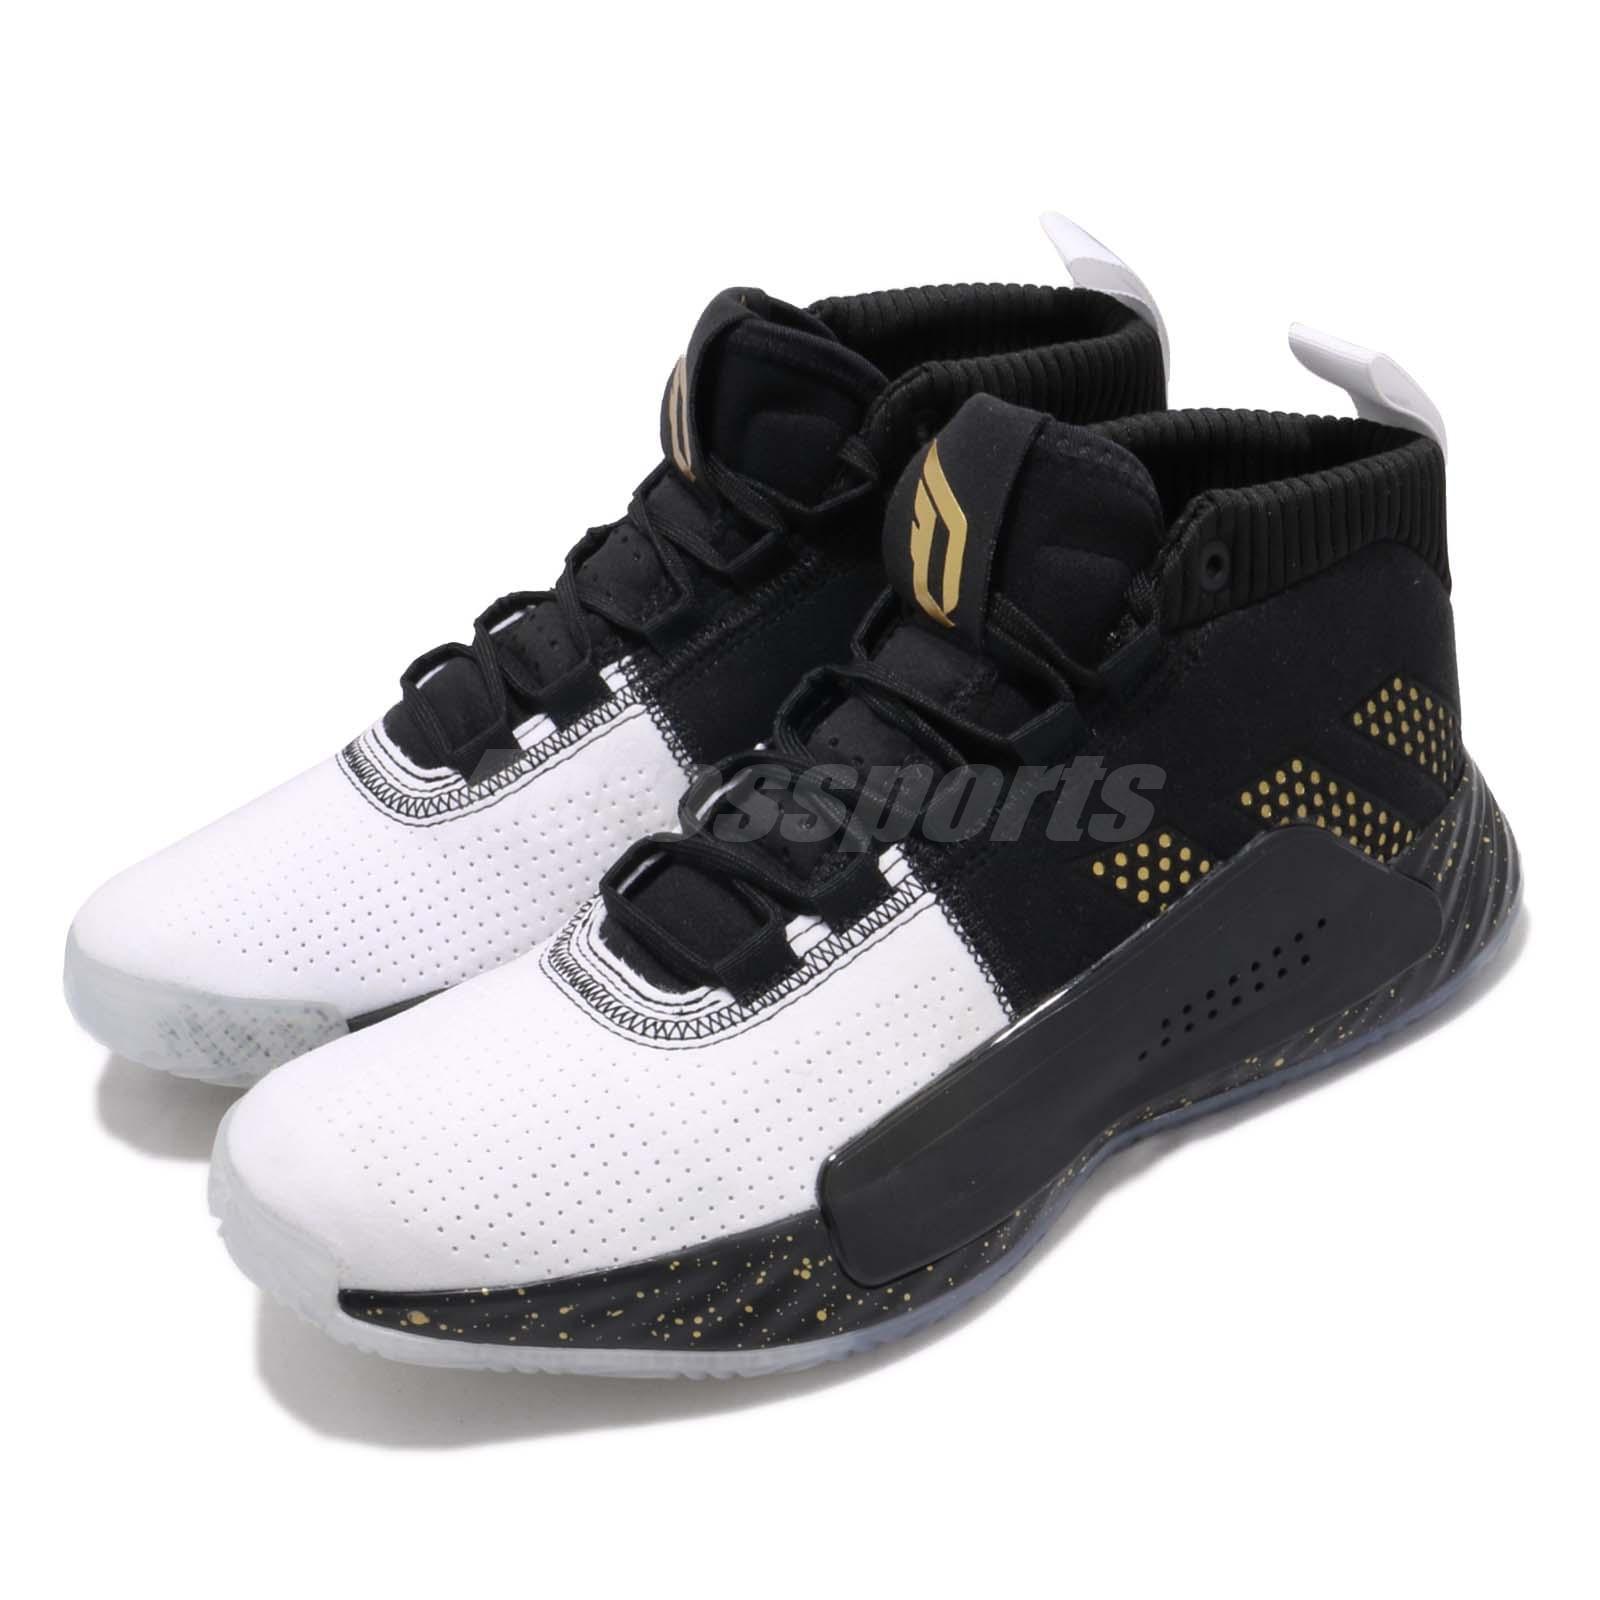 wholesale dealer cd004 09e49 Details about adidas Dame 5 La Heem The Dream Black Damian Lillard  Basketball Shoes EE4049